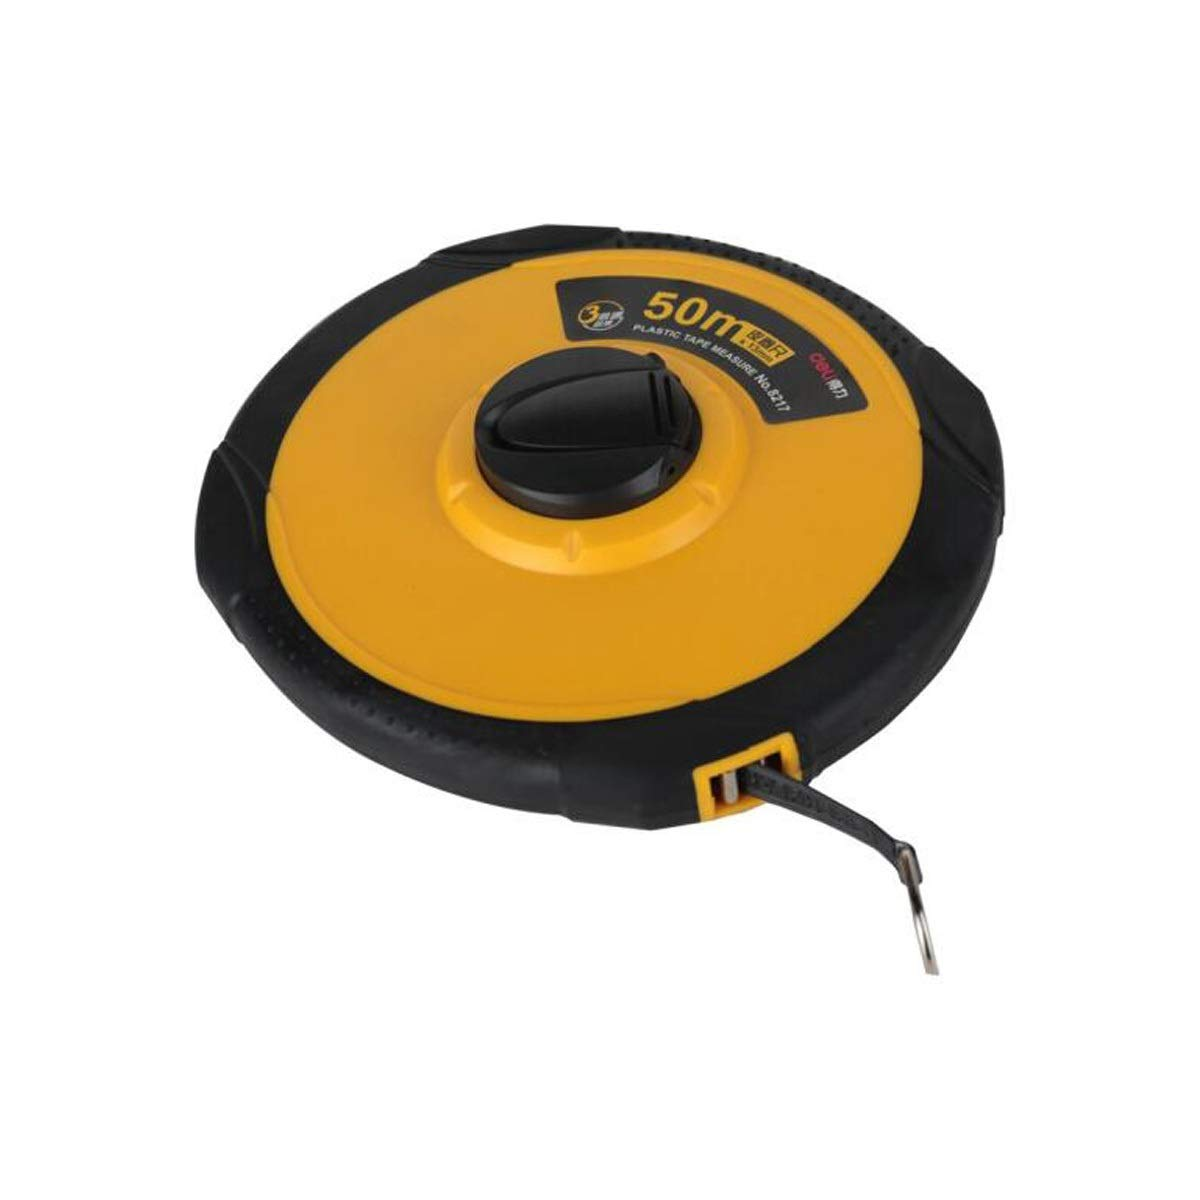 HXSD Ruler, 50m Measuring Precision Scale Shifting Tape Measure/Soft Tape Measure/Engineering Measuring Ruler (Color : Yellow, Size : 50m) by HXSD